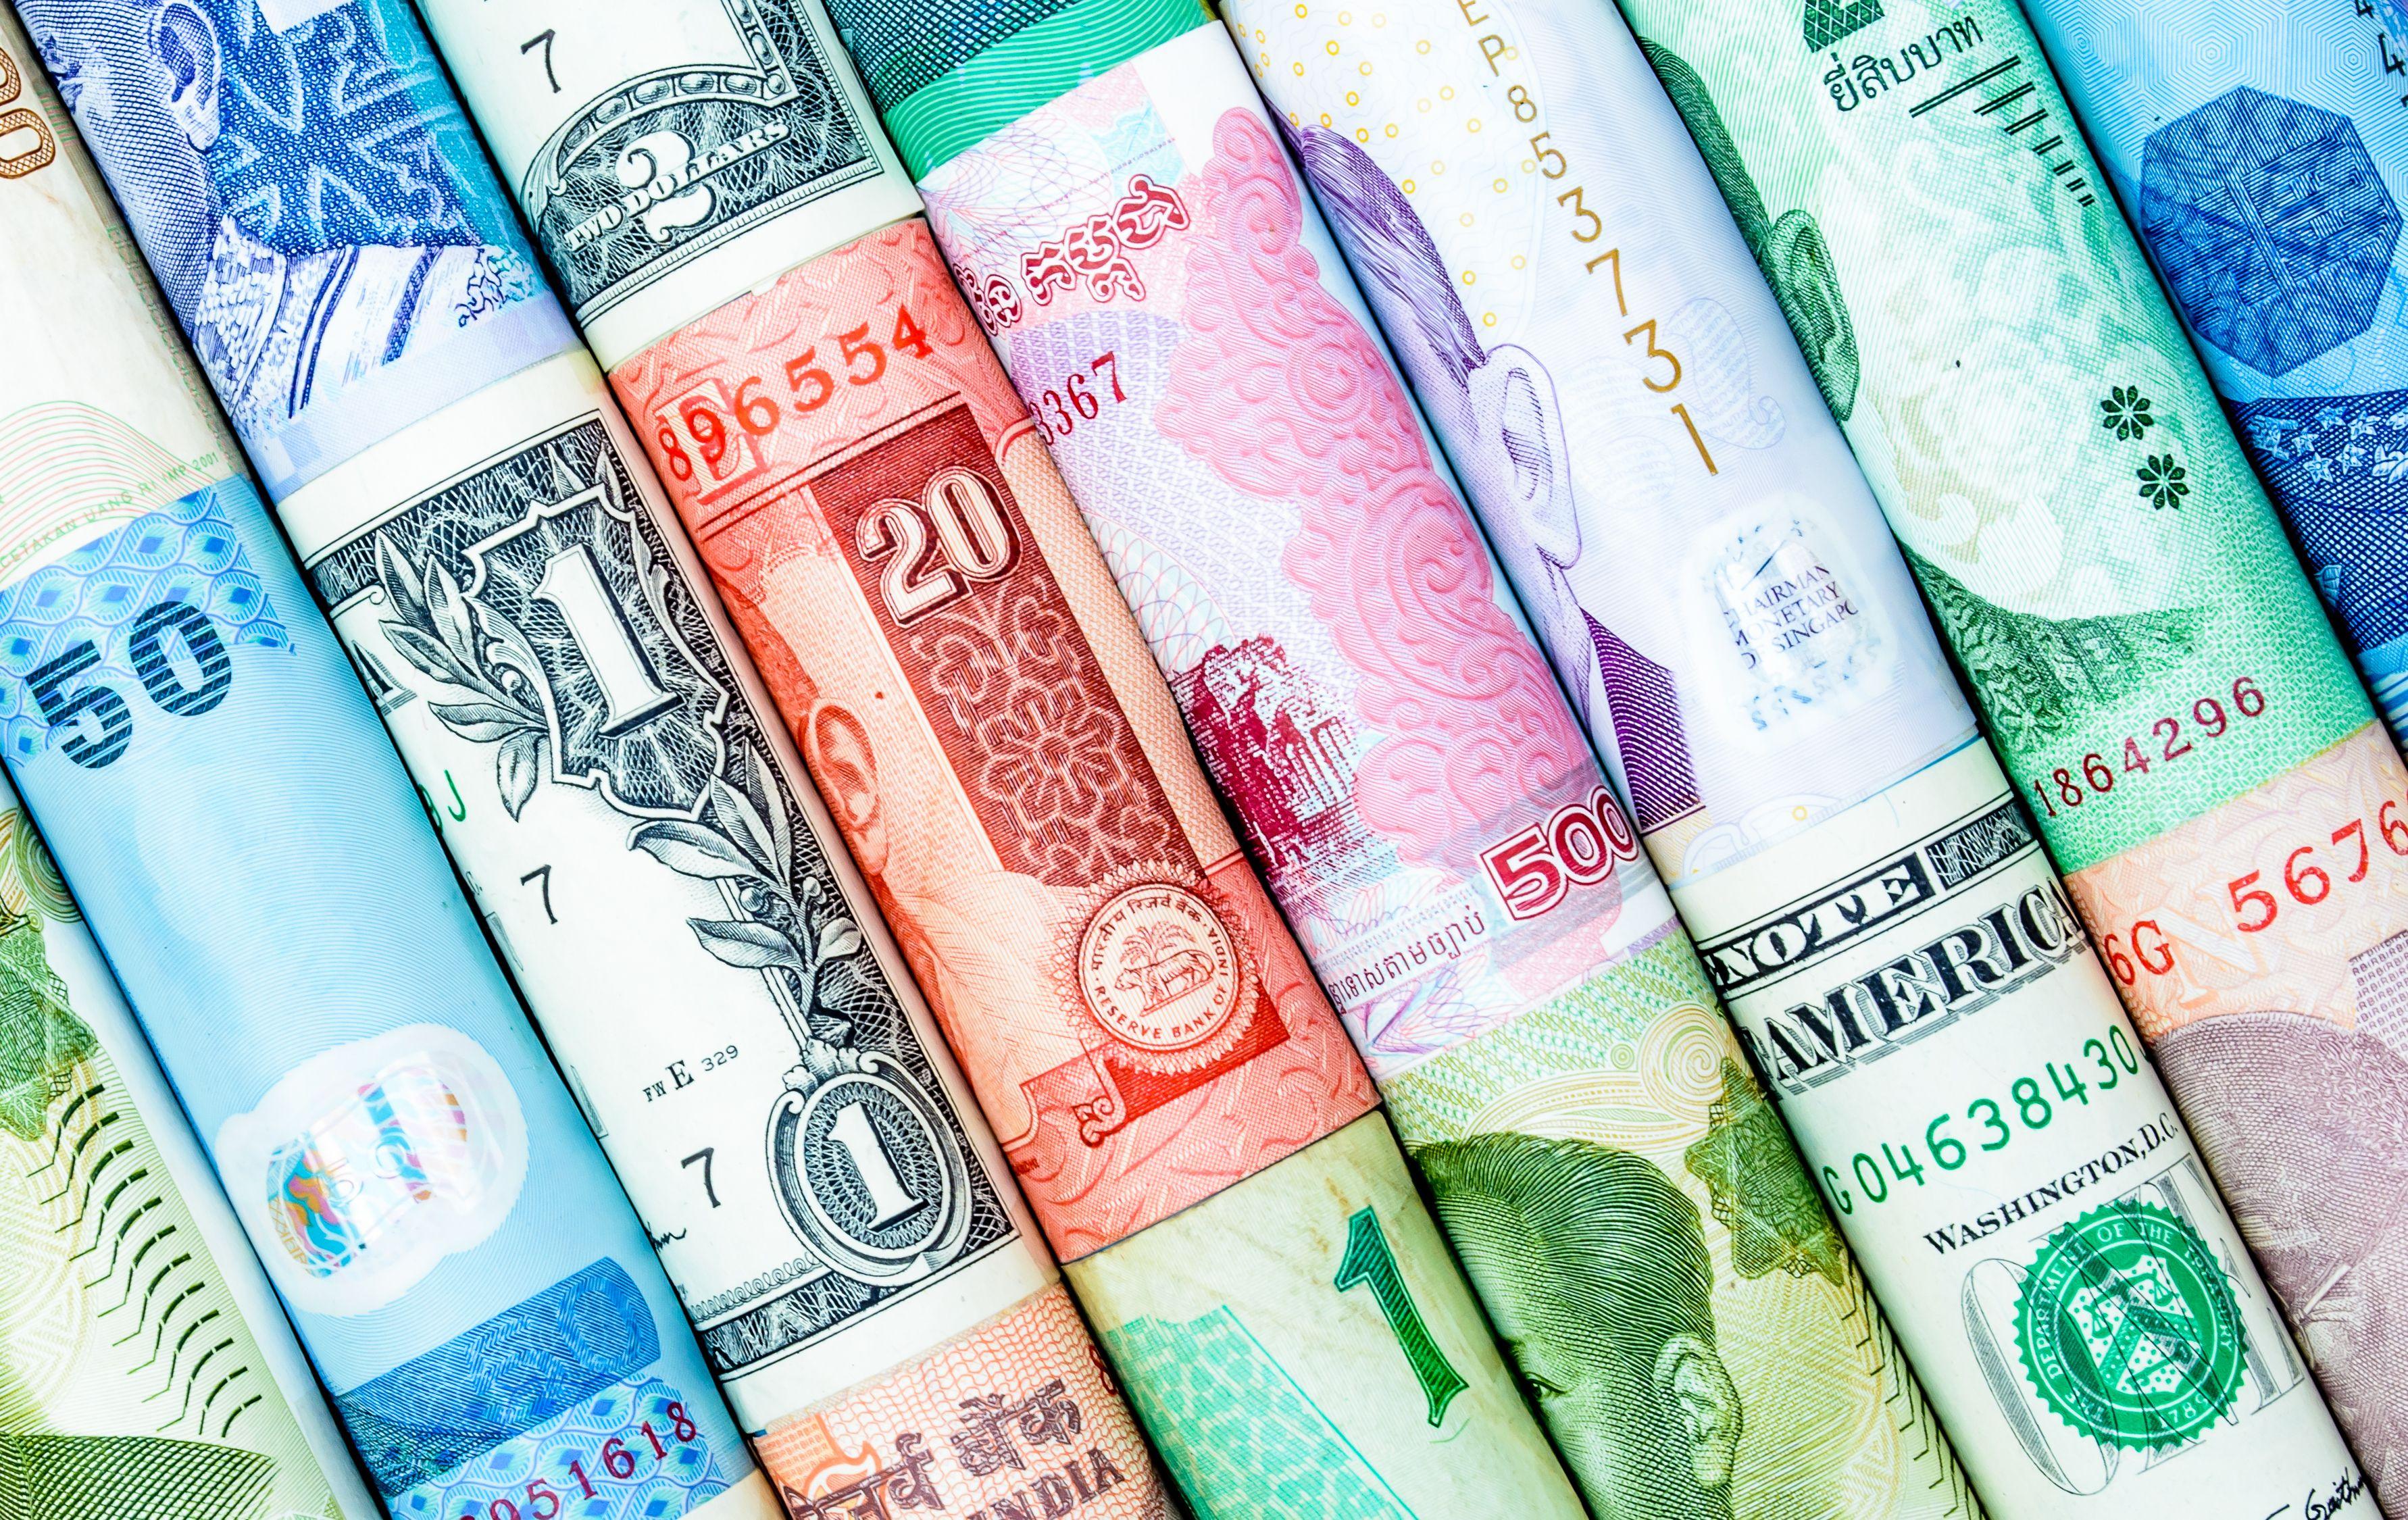 Pin by Harish Panchal on Free Commodity Tips Bitcoin